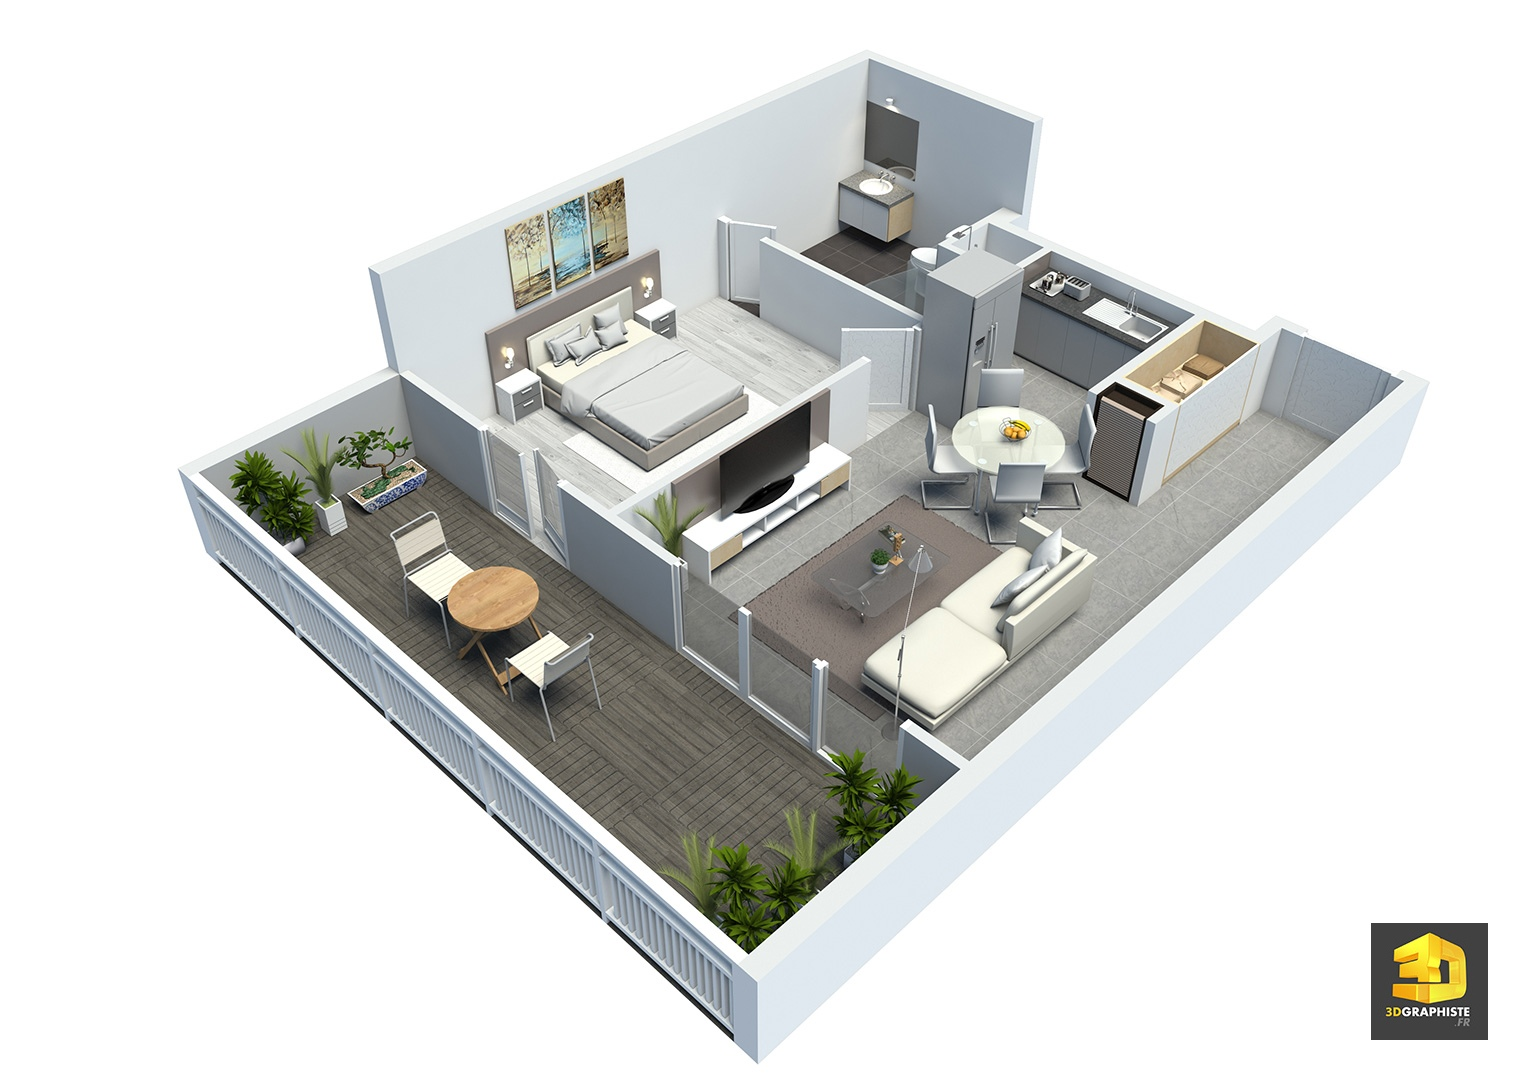 pack de visuels 3d pour programme immobilier r sidence point d 39 orgue 3dgraphiste fr. Black Bedroom Furniture Sets. Home Design Ideas